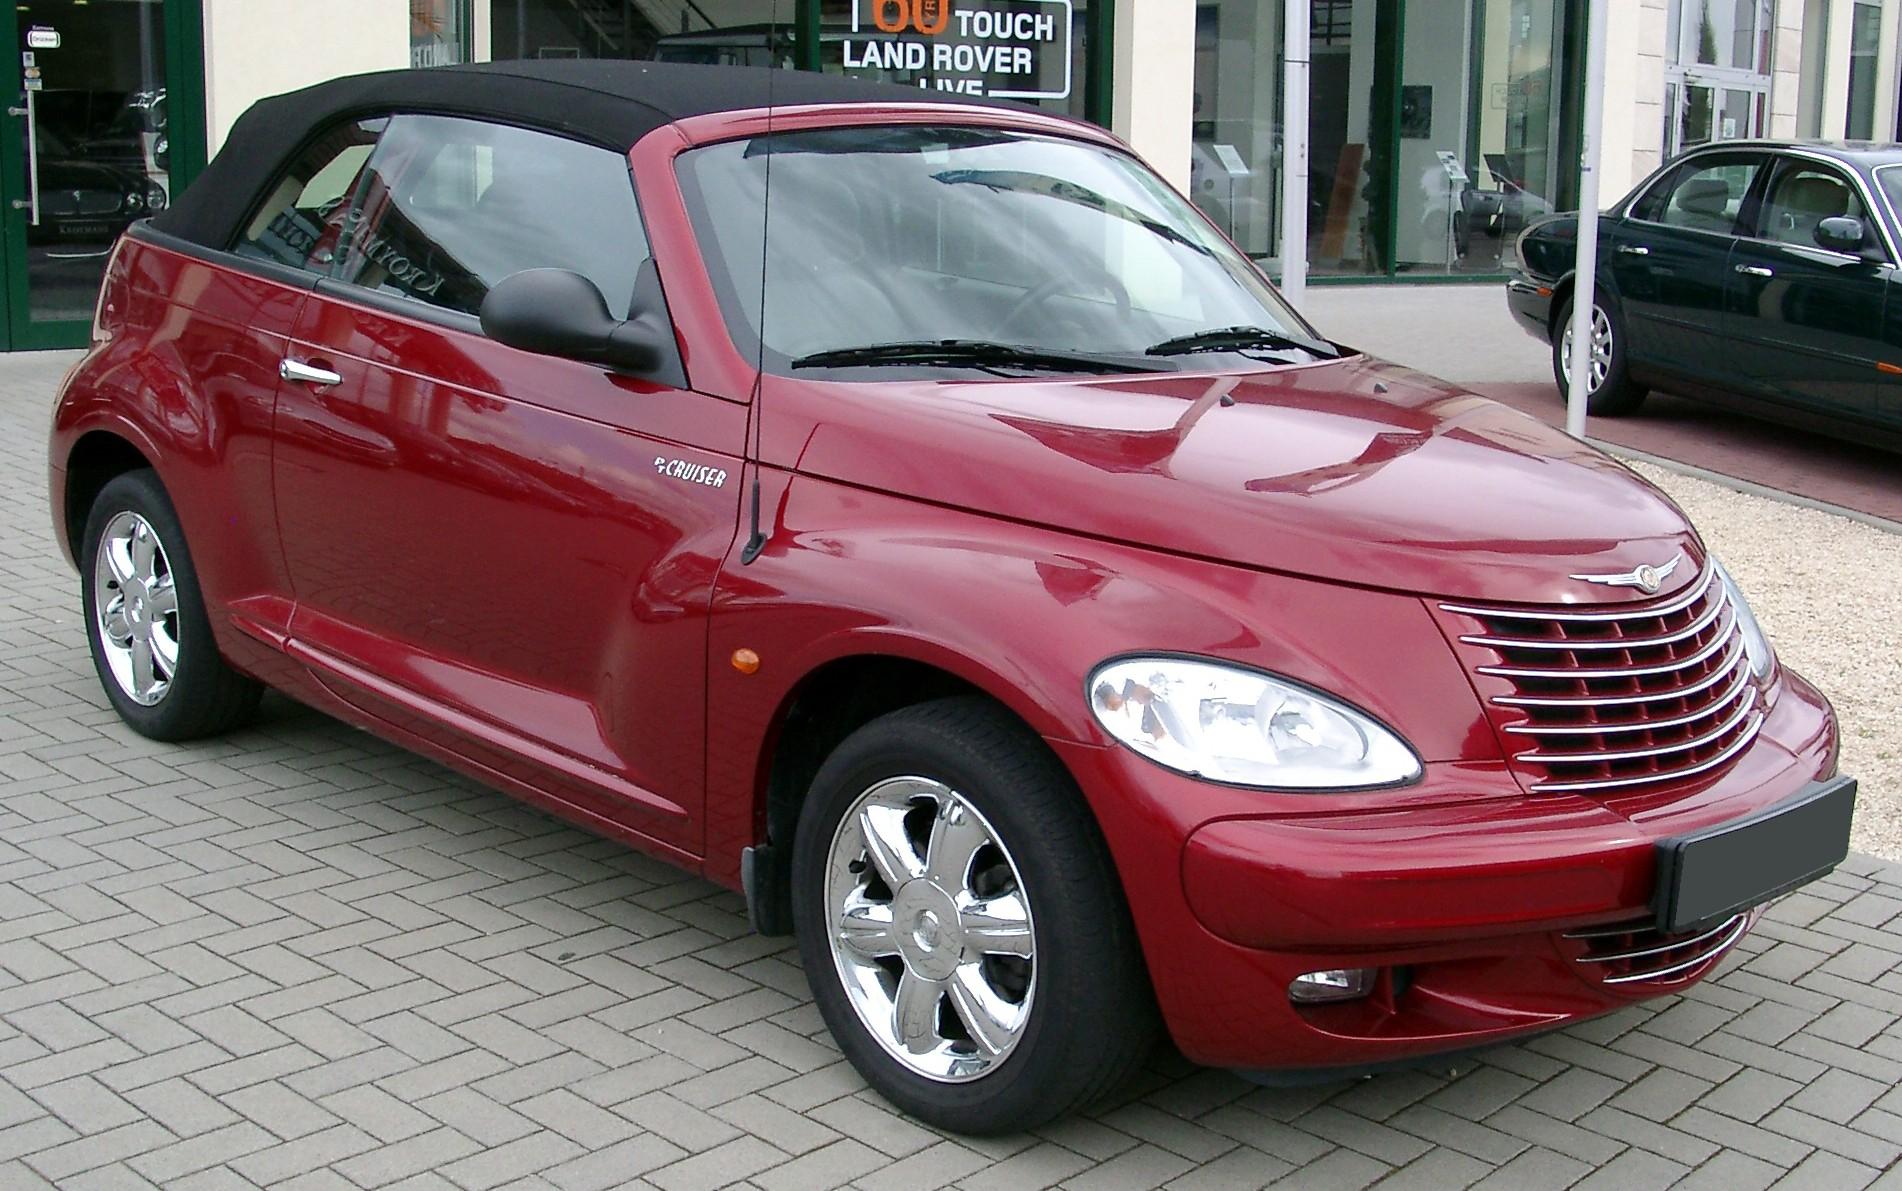 2008 Chrysler PT Cruiser Convertible